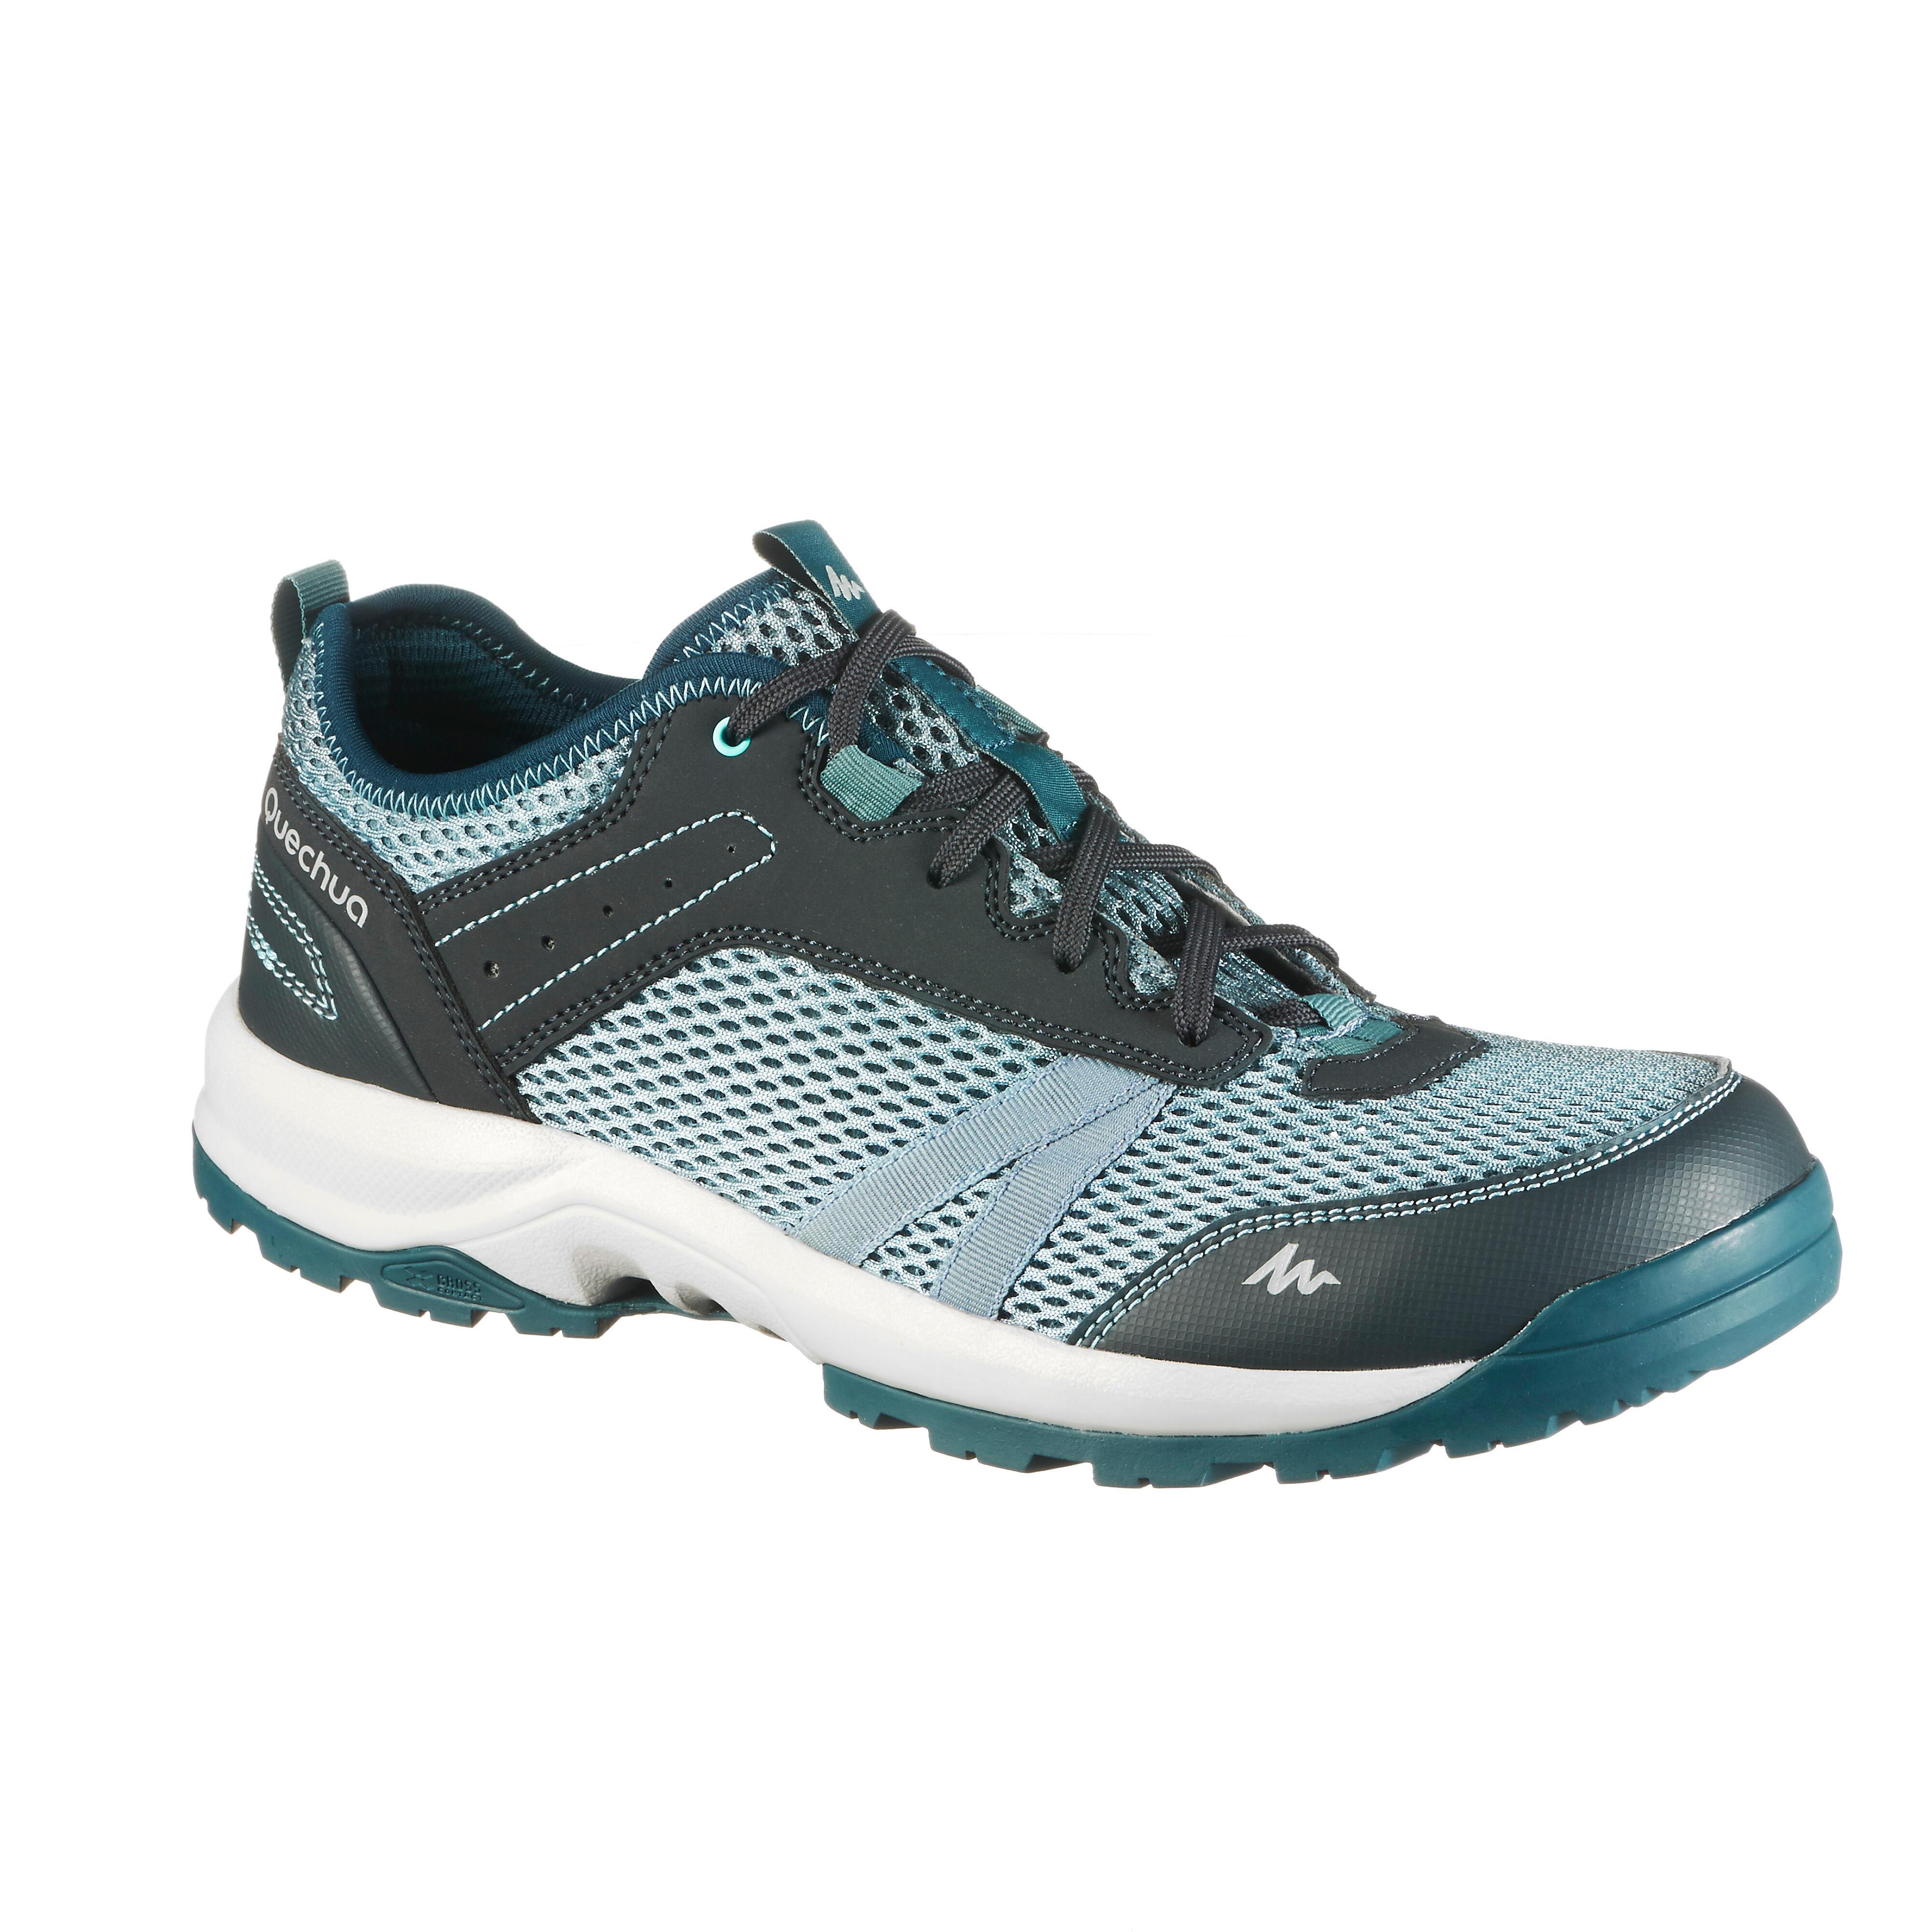 mens walking trainers sale